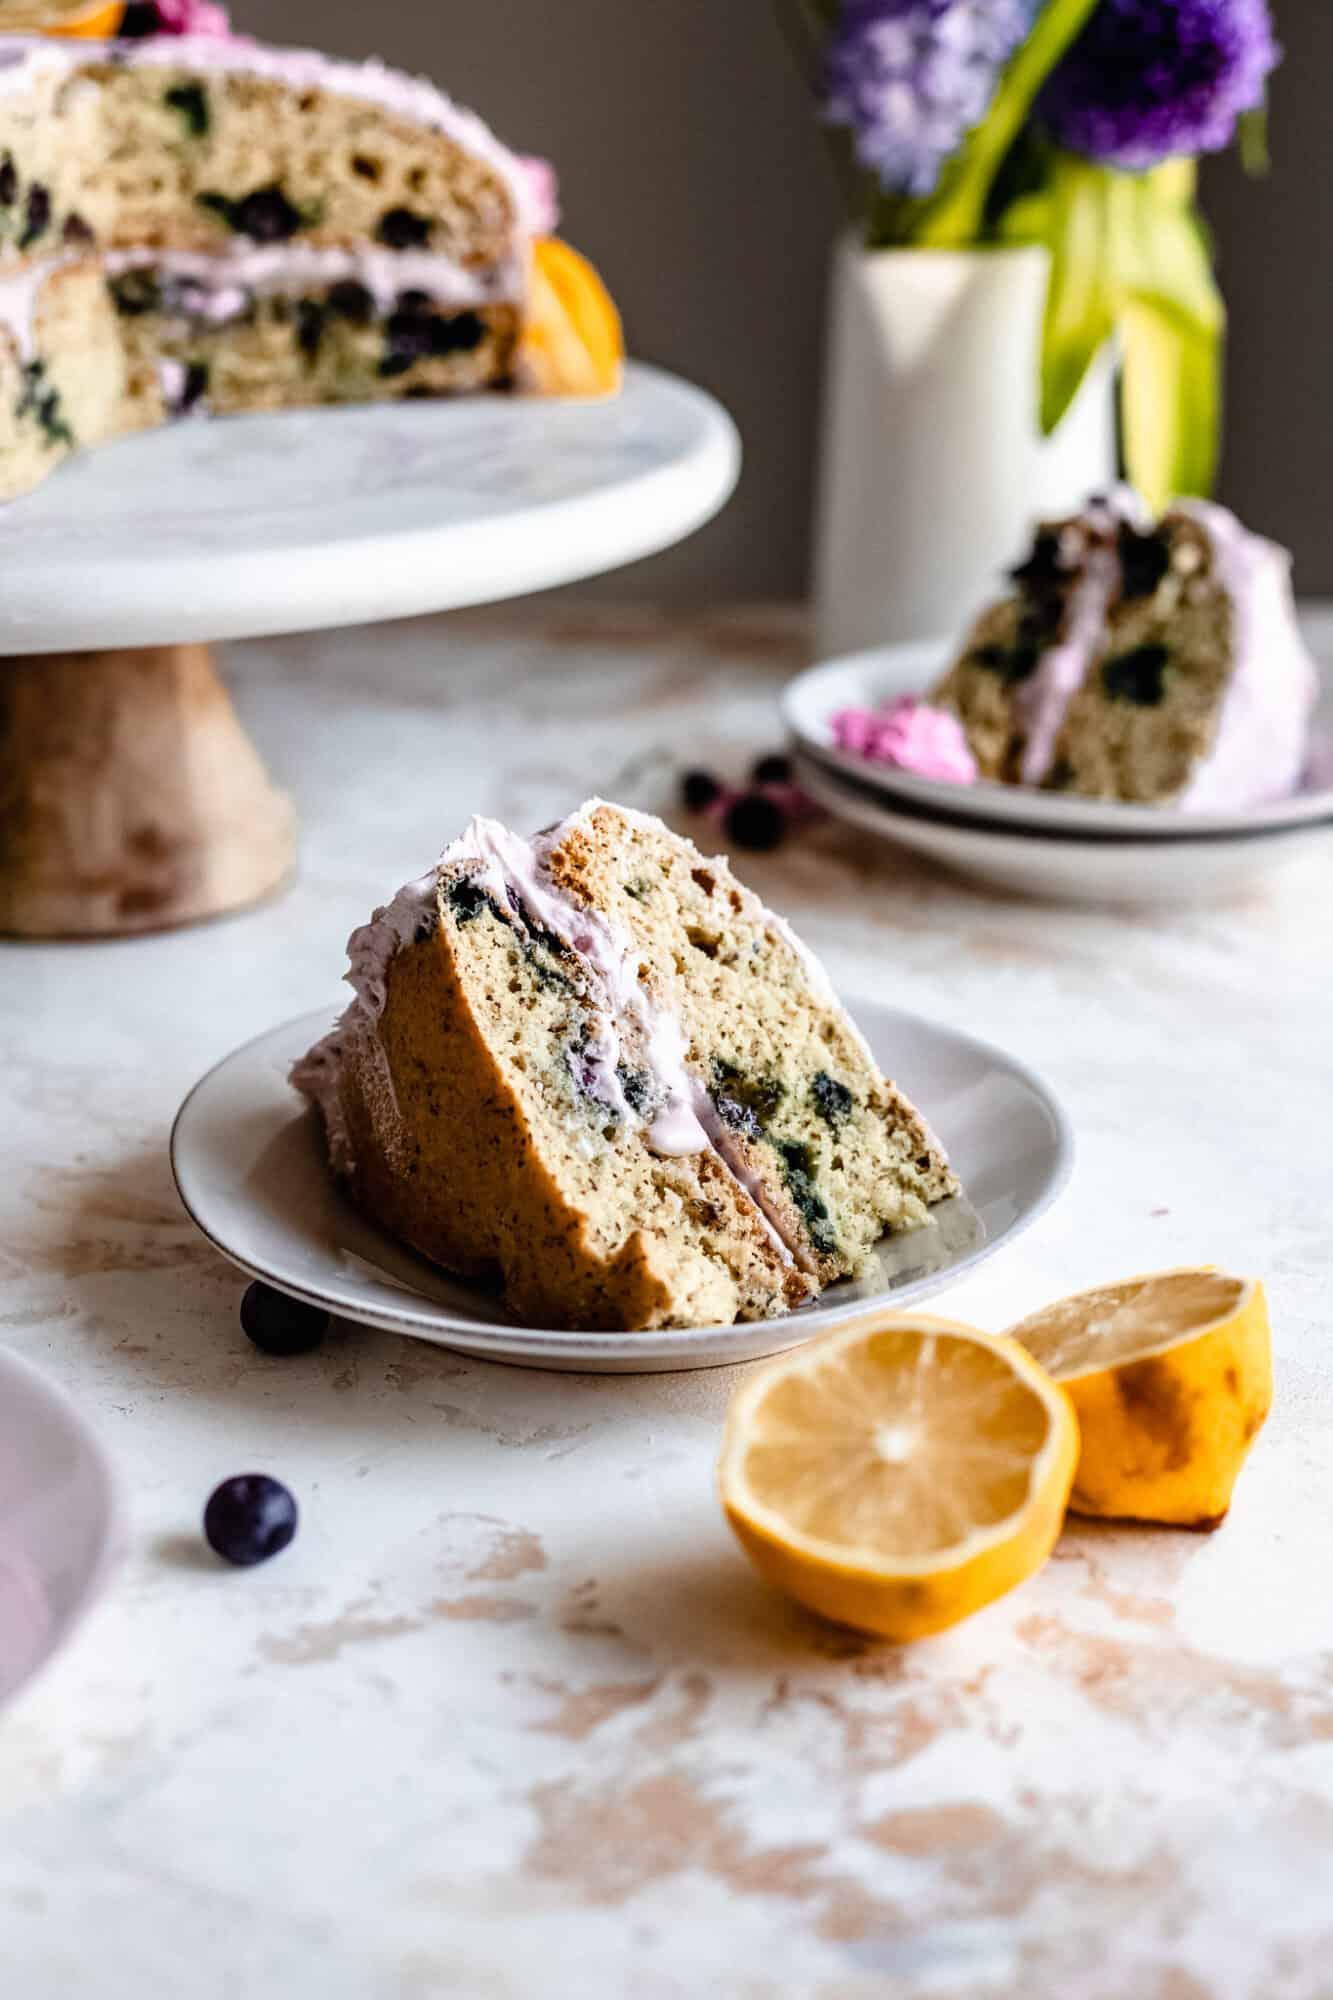 slice of cake with lemon next to it